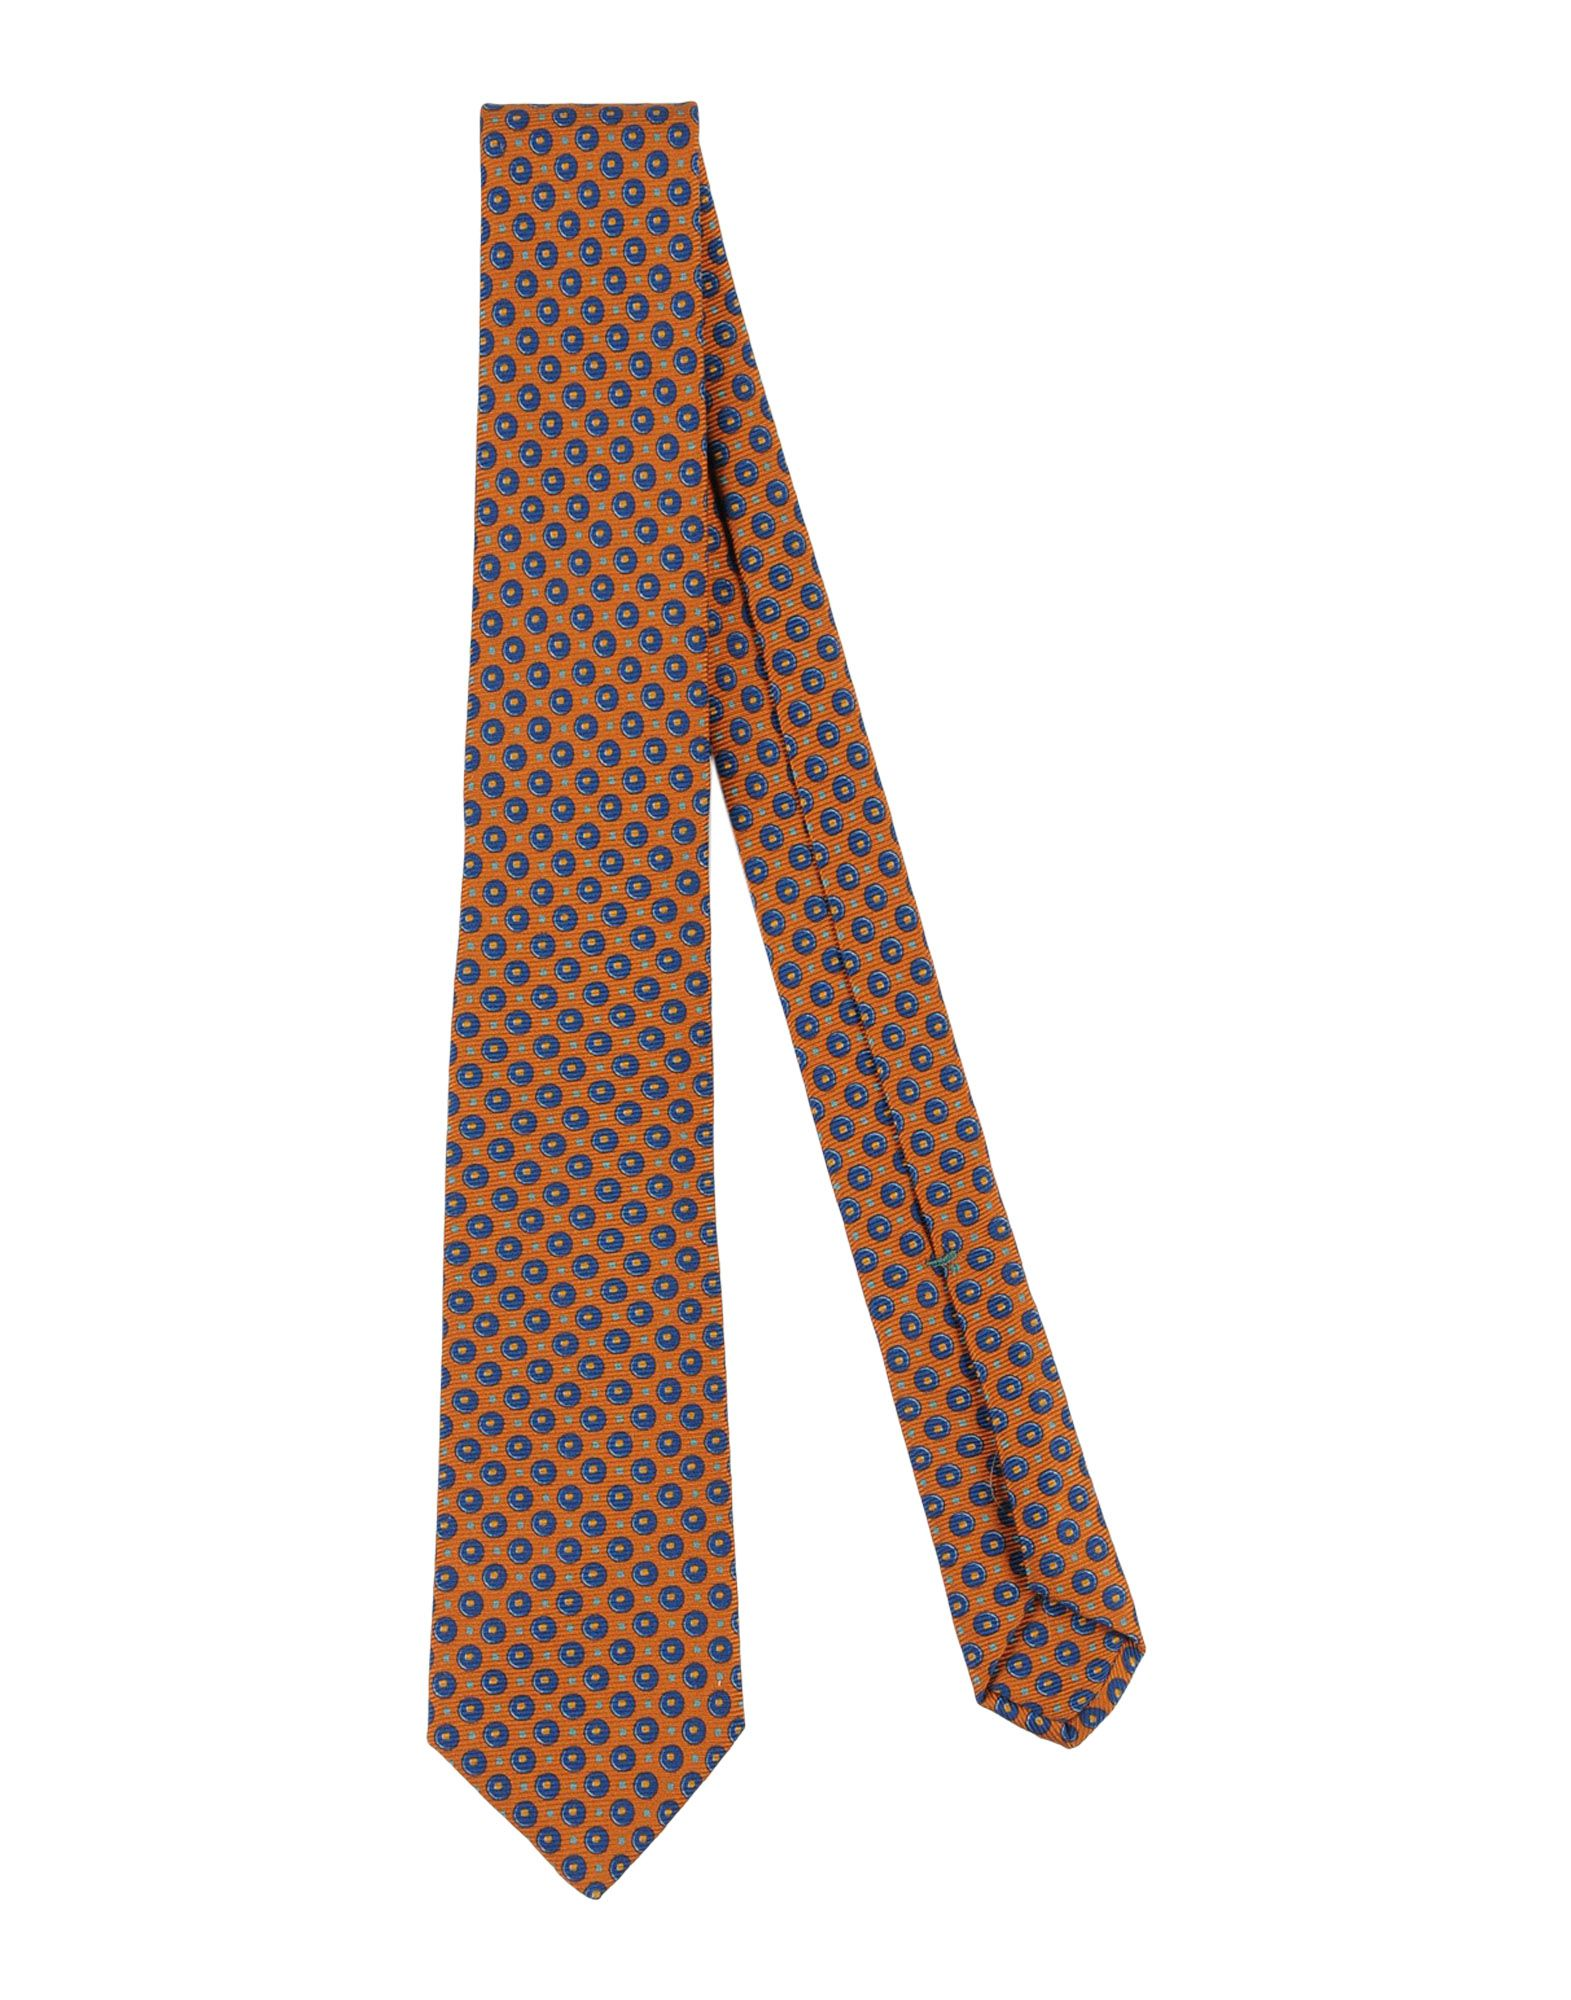 LUIGI BORRELLI NAPOLI Herren Krawatte Farbe Braun Größe 1